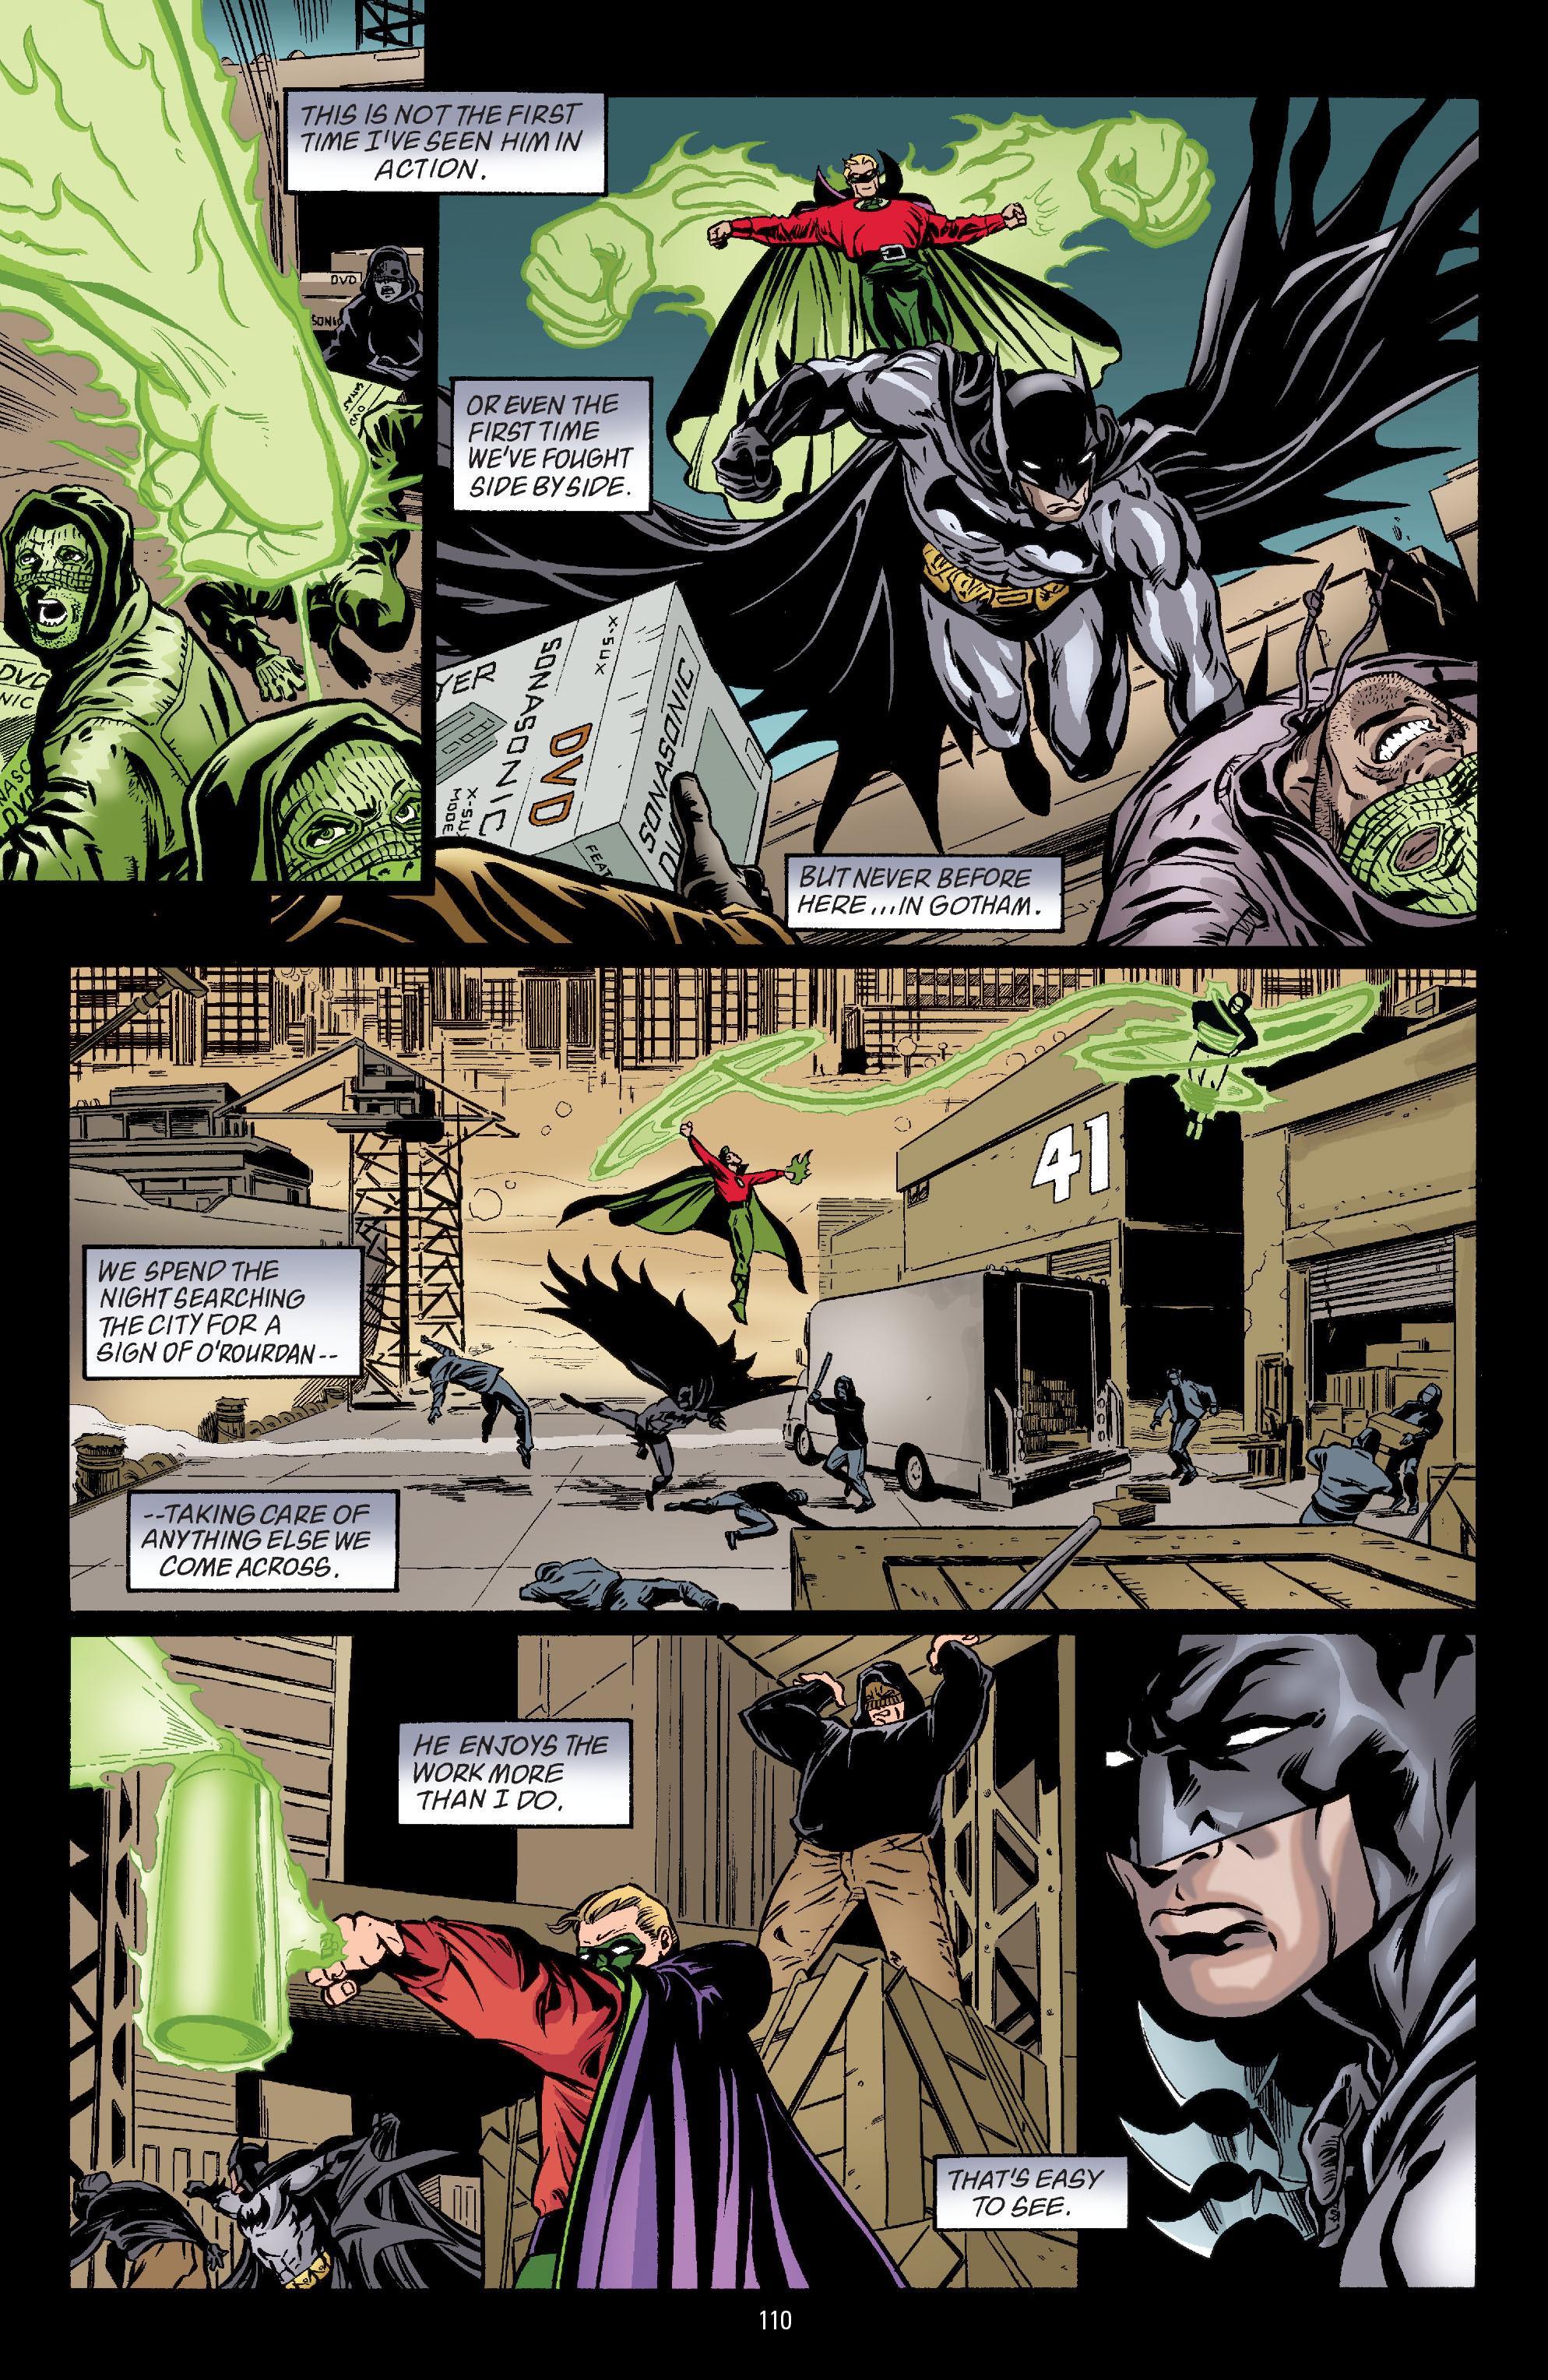 Batman: The Man Who Laughs chap 1 pic 111